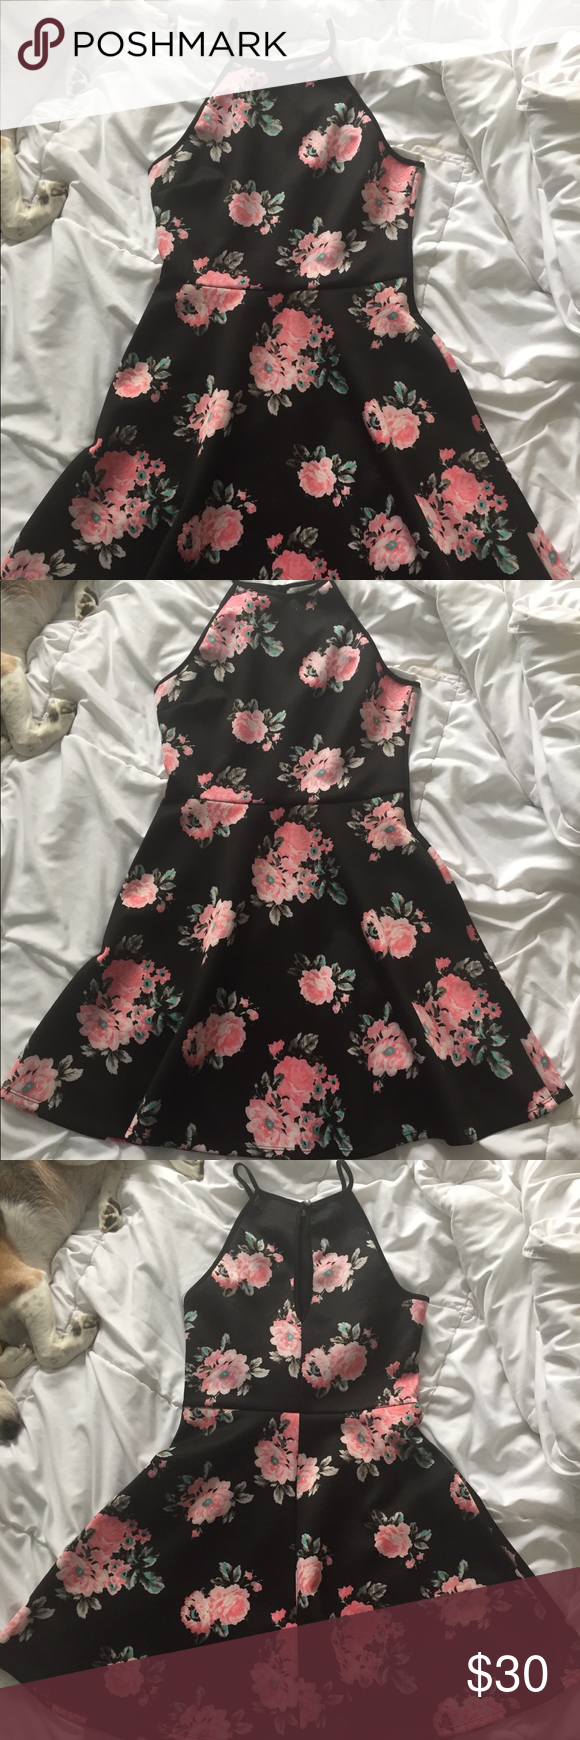 Halter Black Dress With Pink Flowers Black Halter Dress Black Dress Dresses [ 1740 x 580 Pixel ]